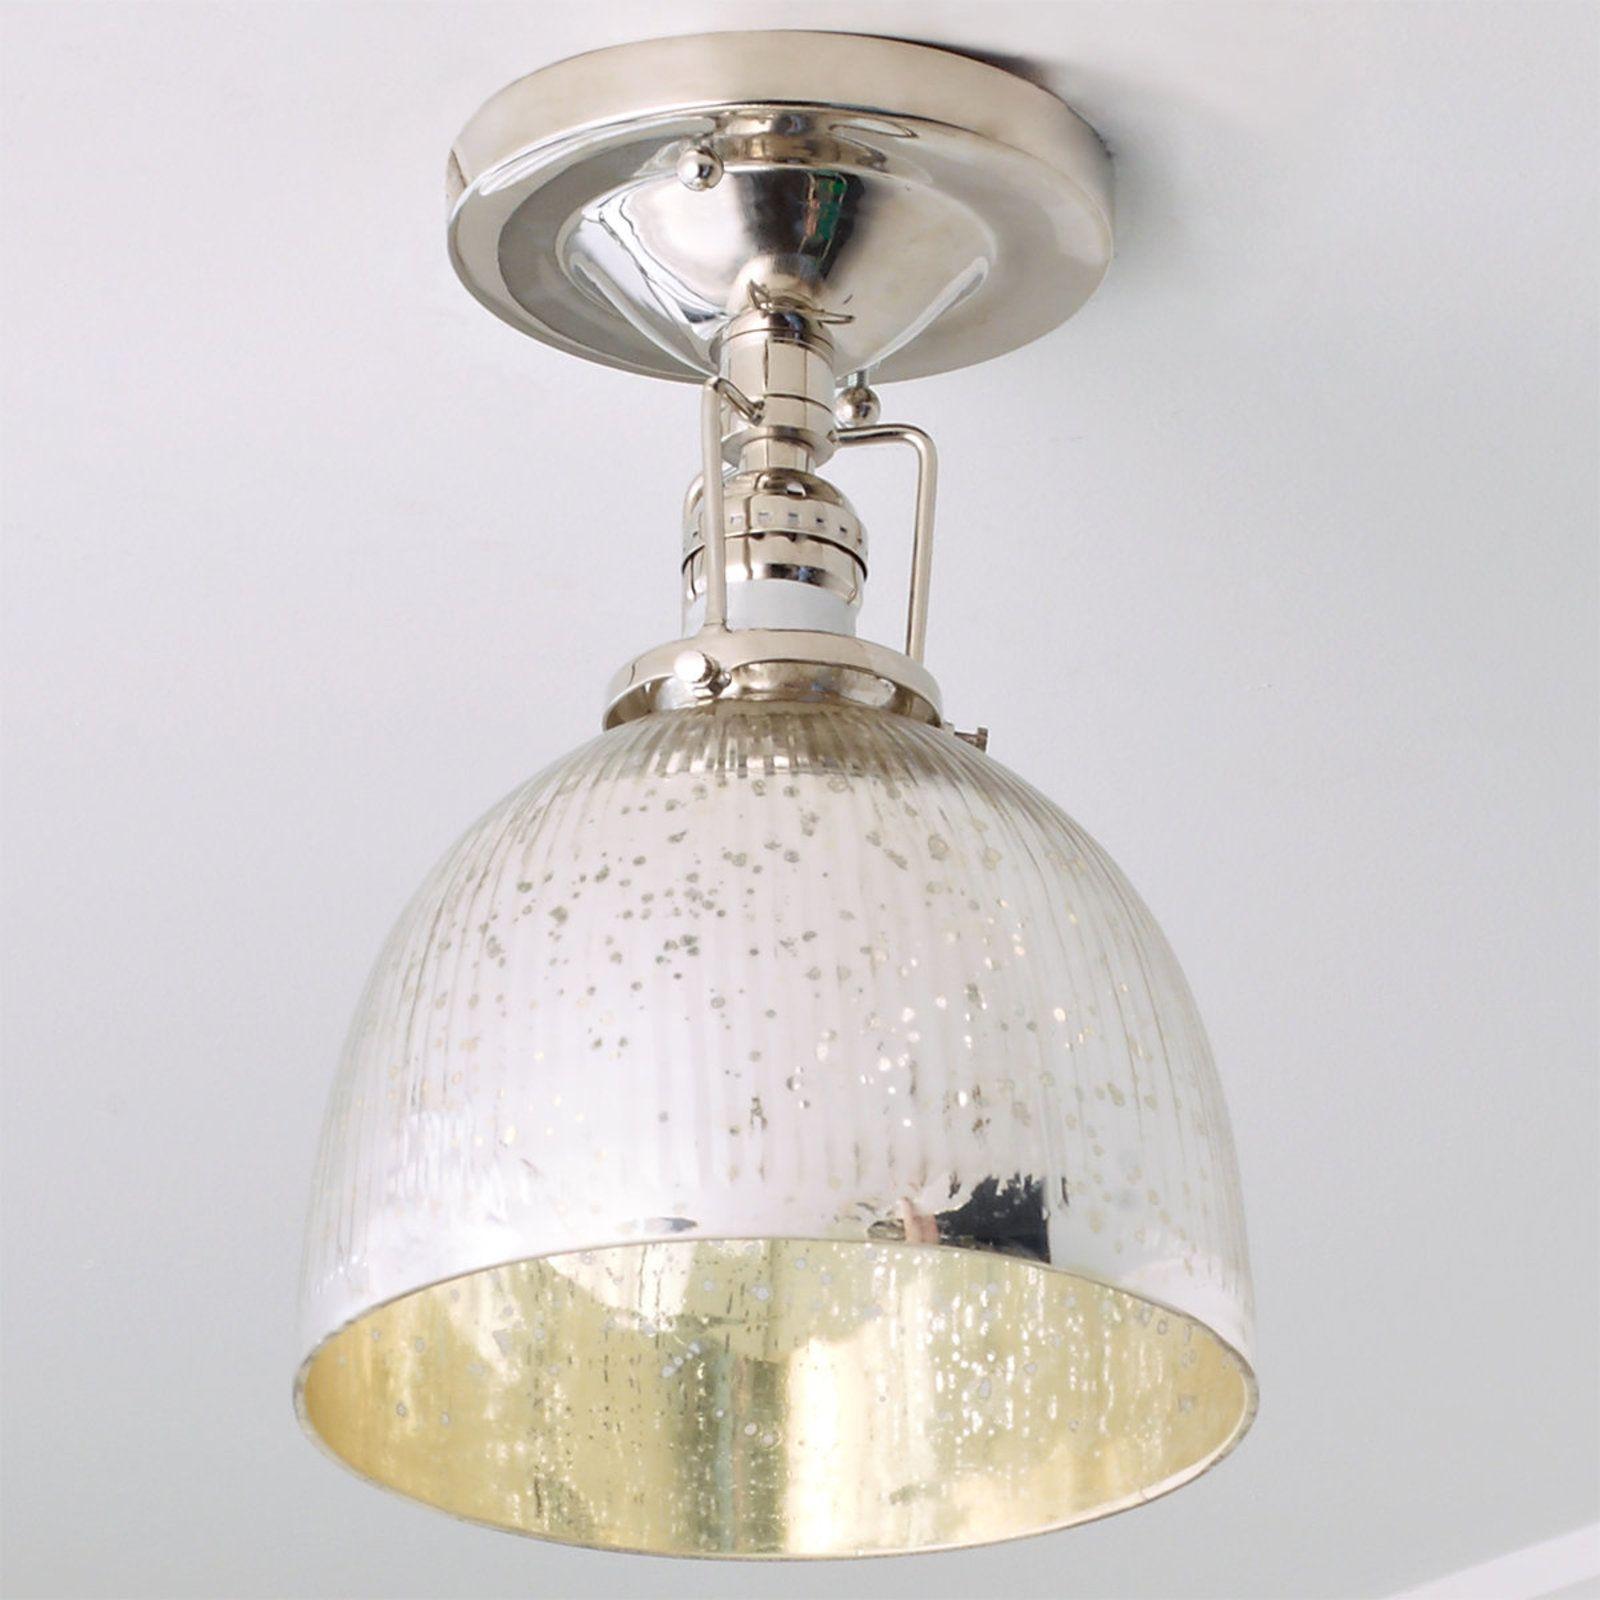 Modern Mercury Glass Restoration Ceiling Light Polished Nickel Ceiling Lights Glass Light Fixture Mercury Glass Lighting